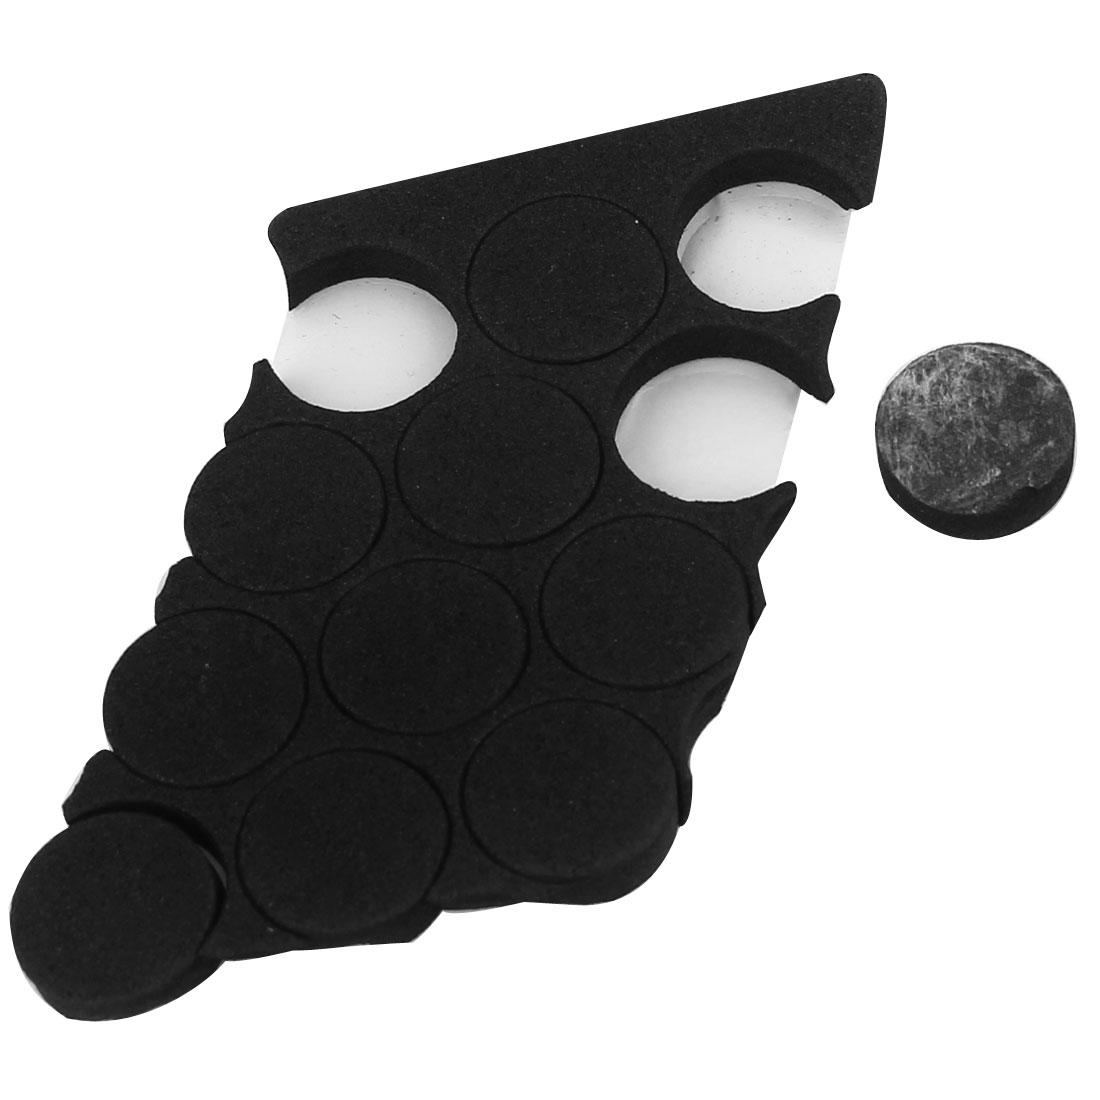 10 Pcs Black EVA Furniture Foot Protecter Pad 20x5mm